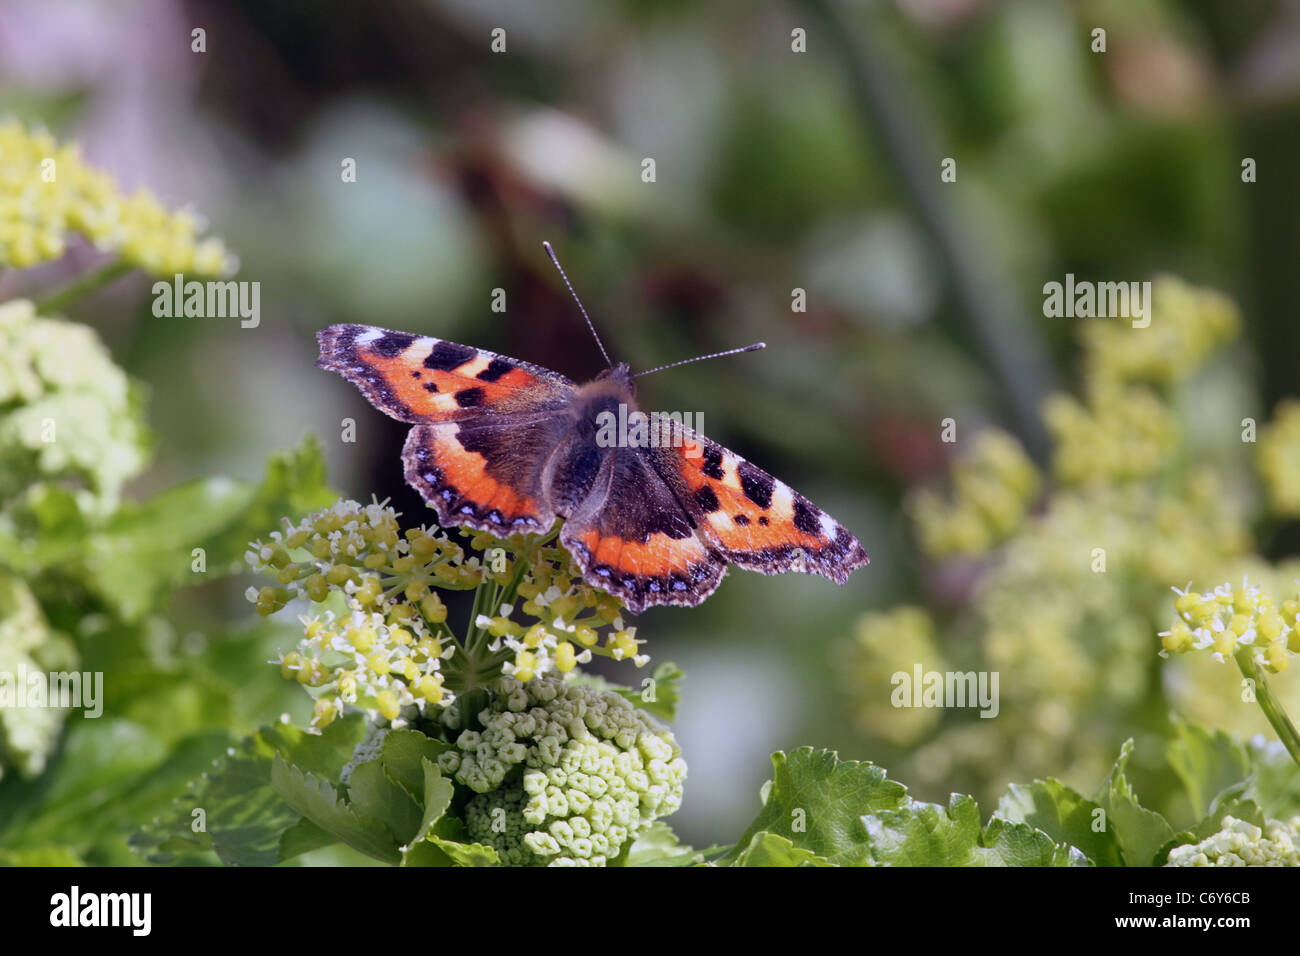 Small Tortoiseshell Butterfly, Aglais urticae, Nymphalidae family, photo taken in Ilfracombe, Devon, United Kingdom - Stock Image